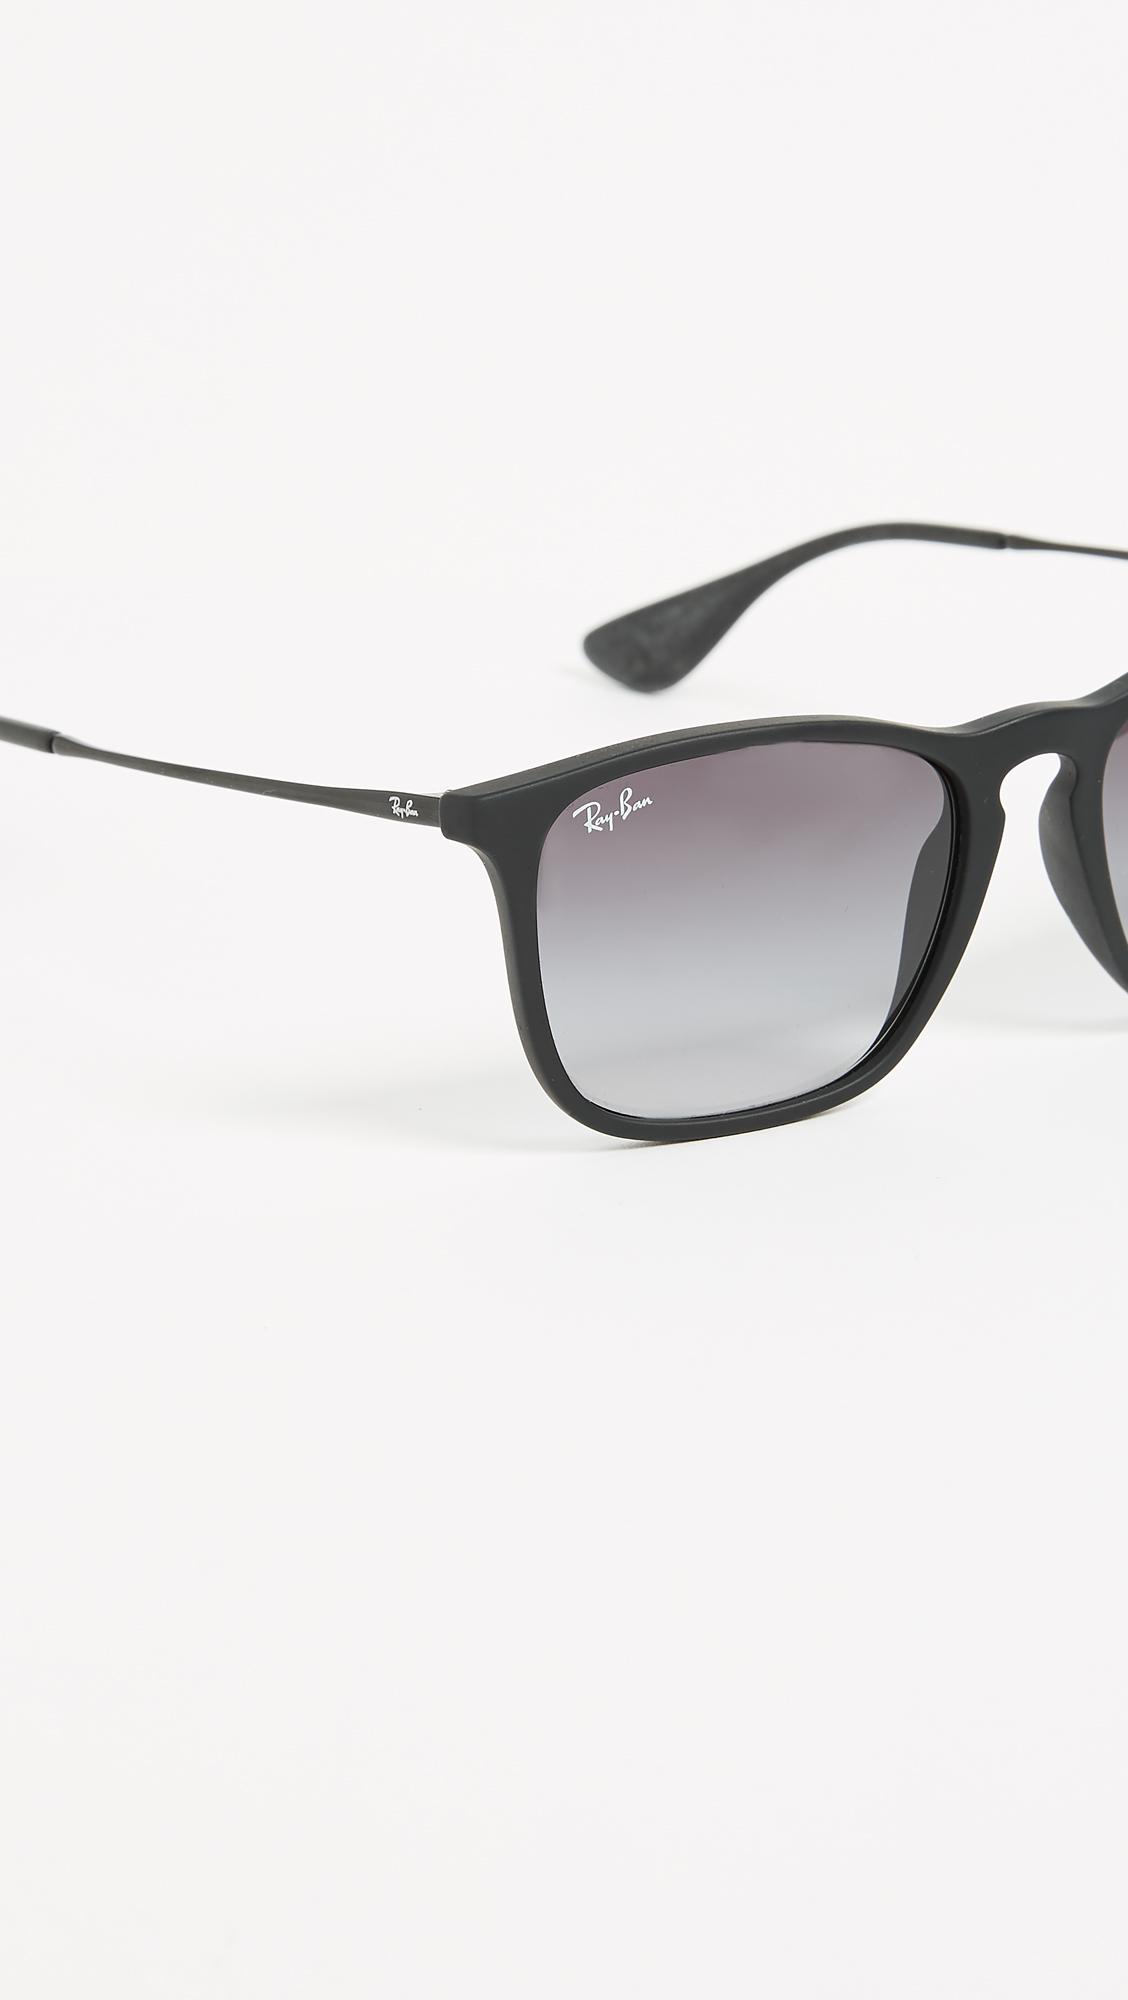 25518c5a210 Ray-Ban RB4187 Chris Square Sunglasses